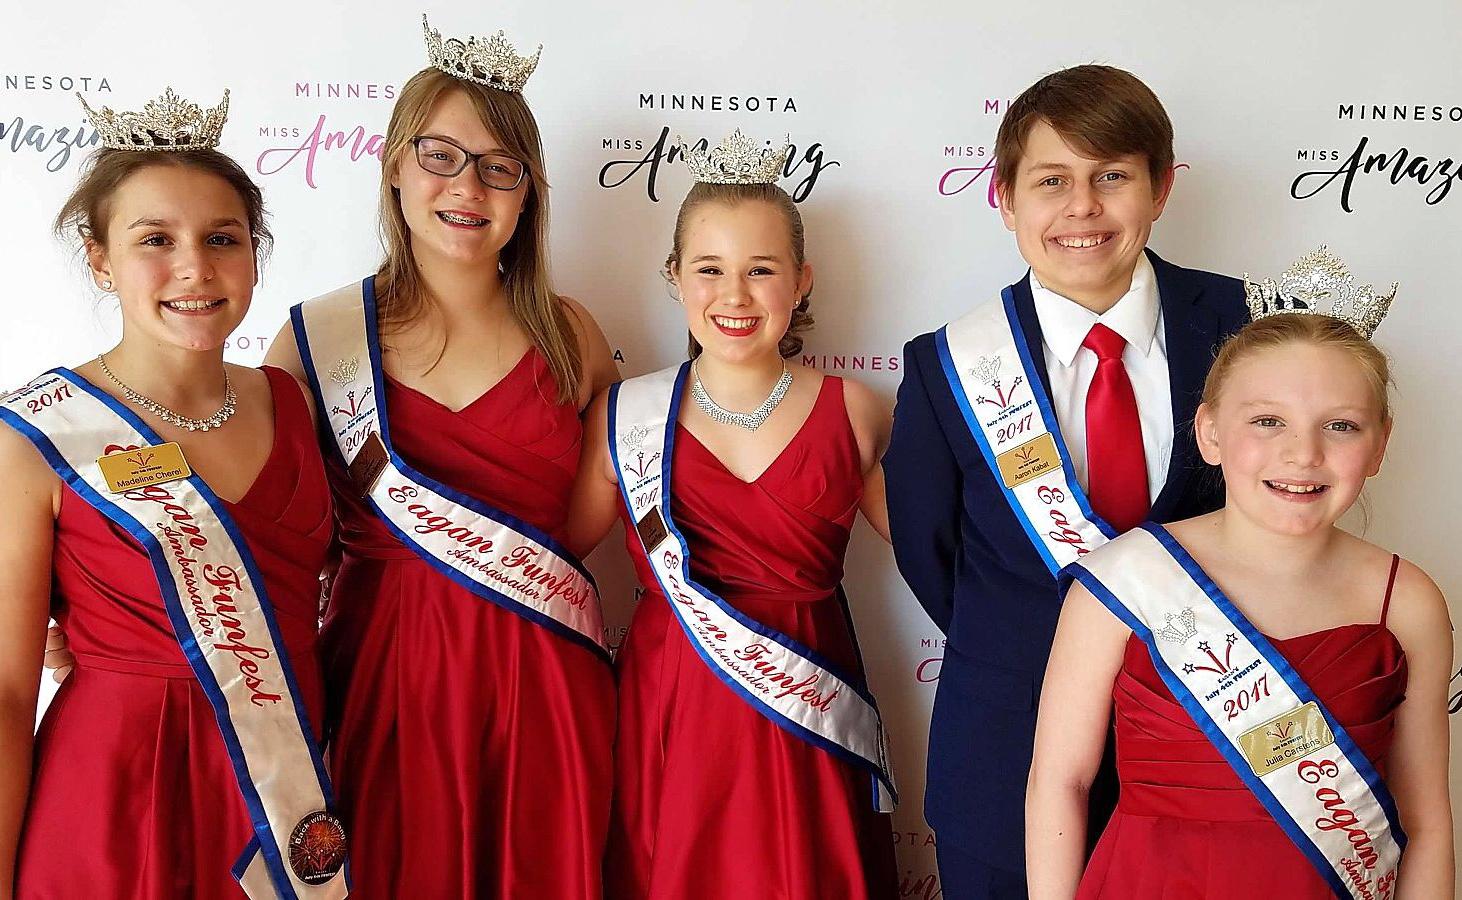 Photo courtesy of VMSS 7th grader Lauren Foss, center.